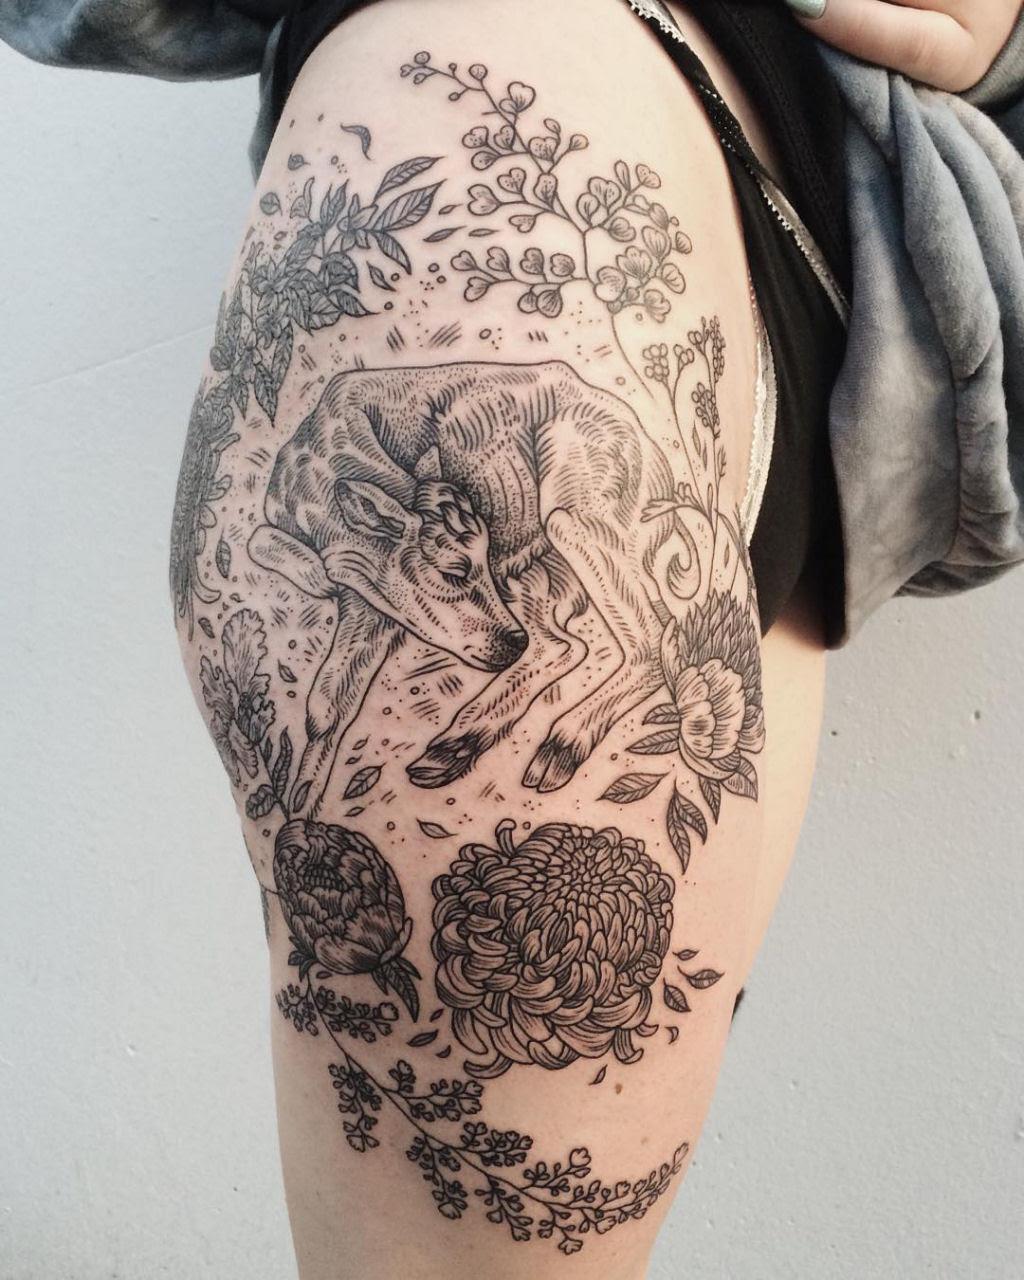 Tatuagens inspiradas na natureza combinam gravuras de estilo vintage de fauna e flora 11